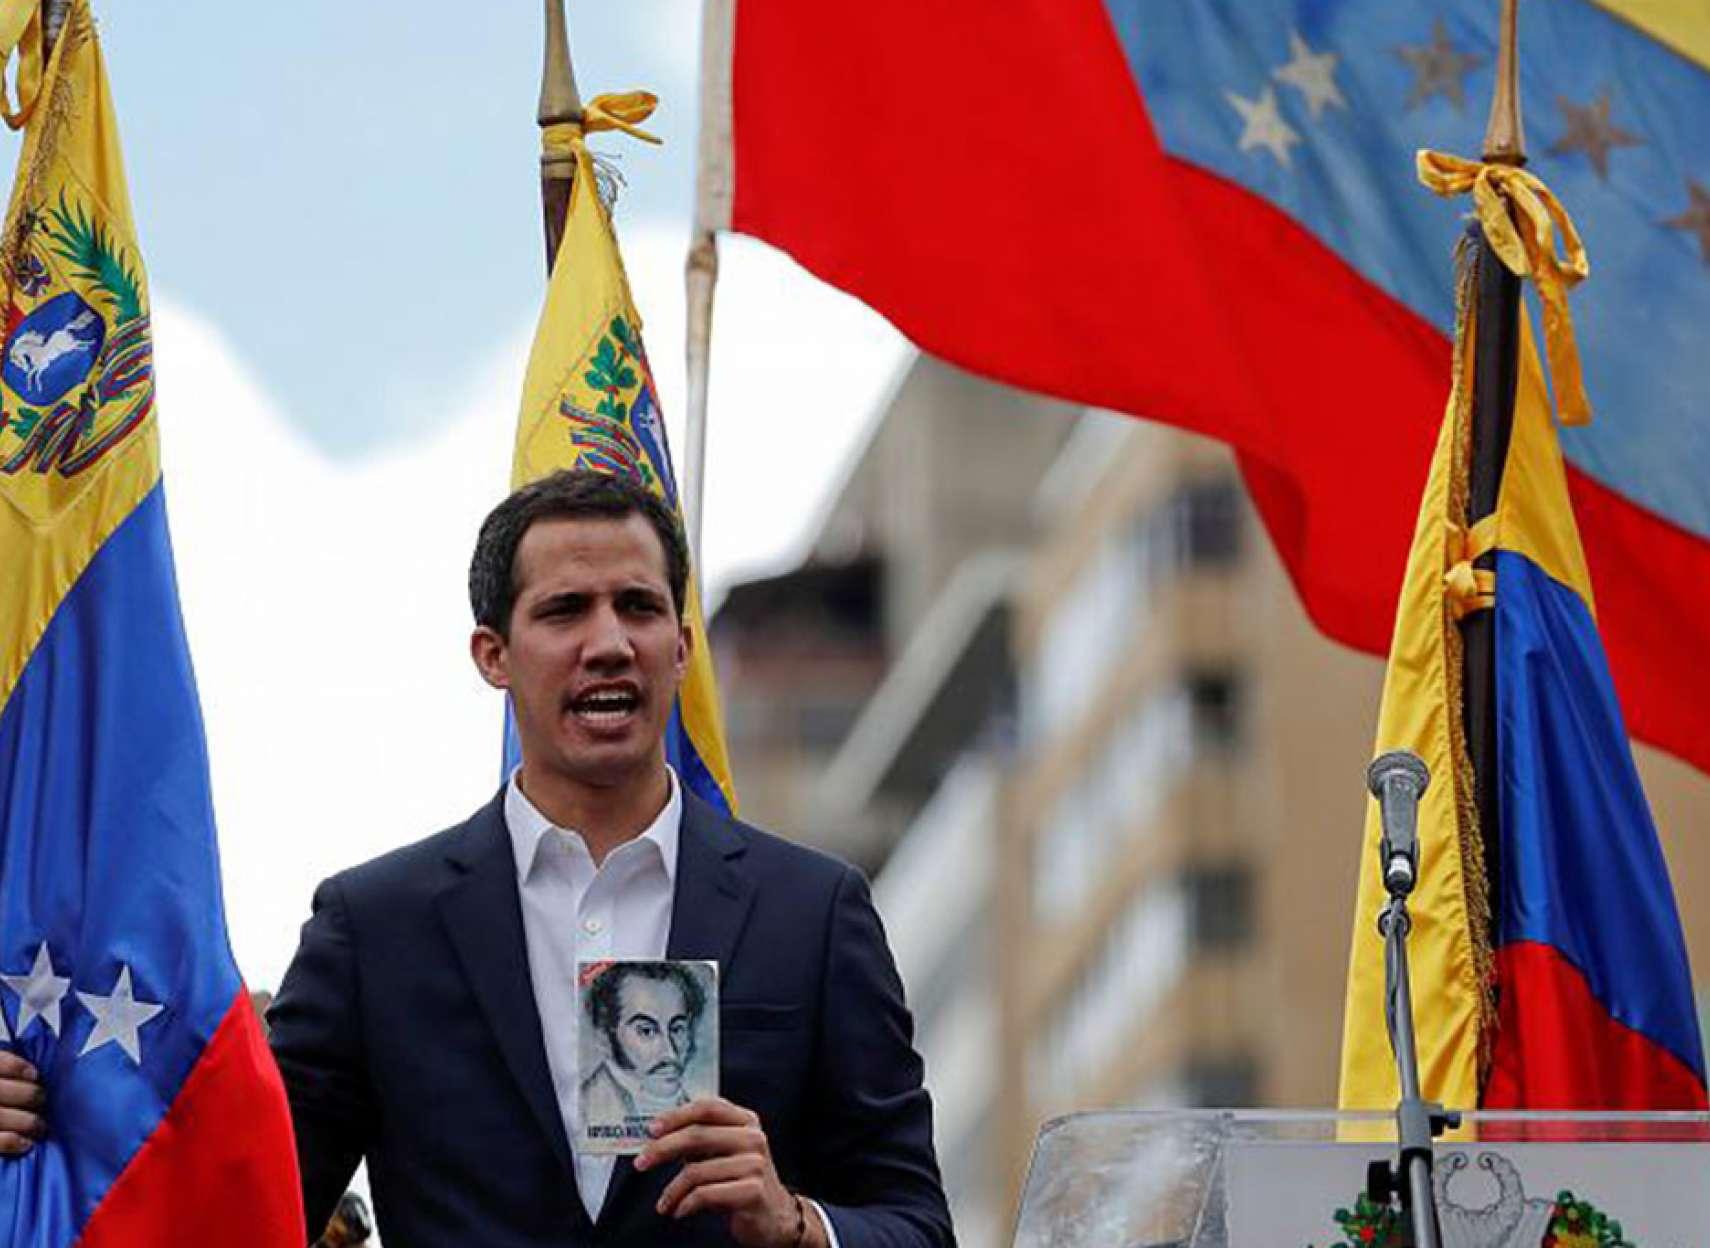 news-venezoela-amrica-mokhalefin